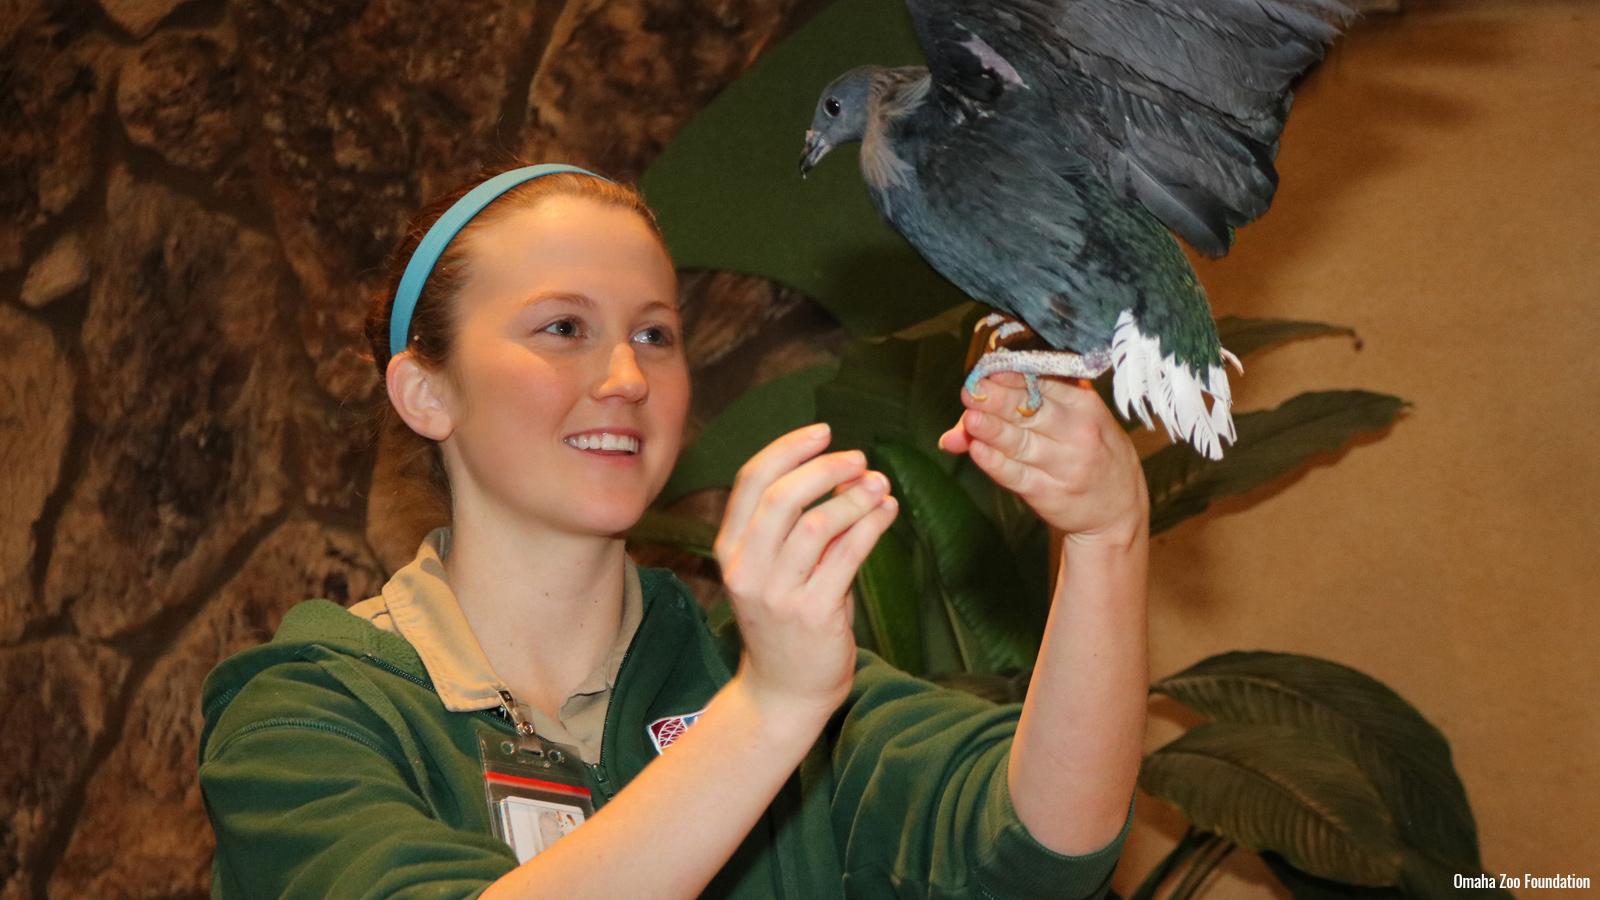 Zoo staff with bird